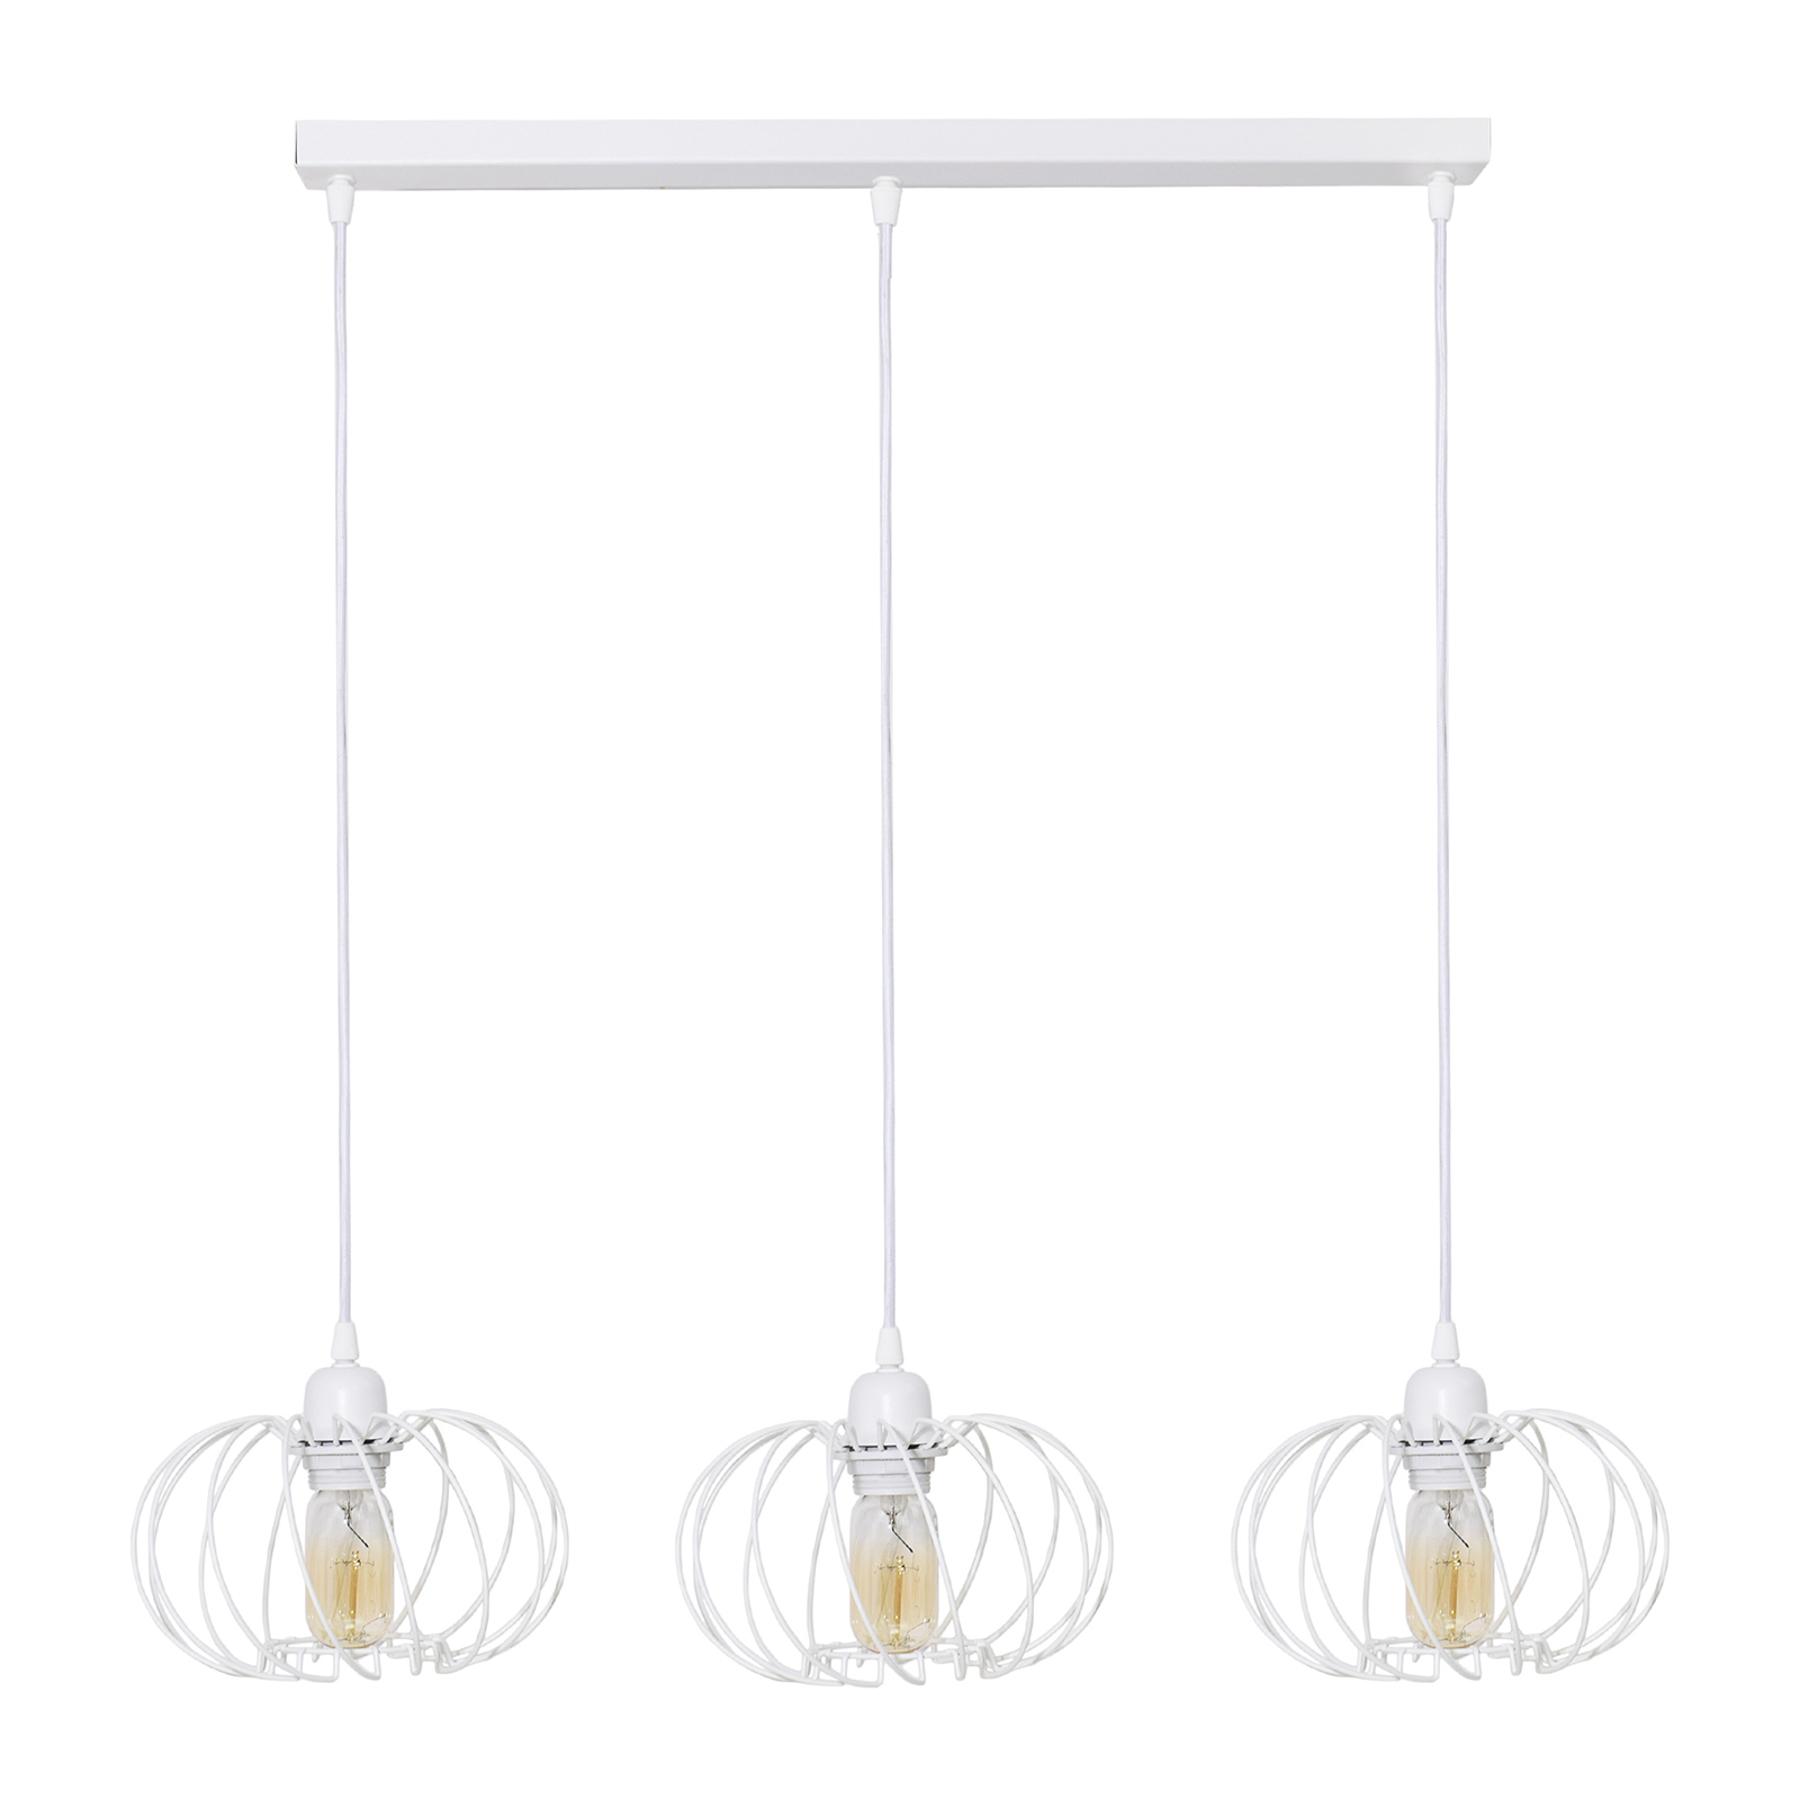 Suspension Kula, à 3 lampes, blanche